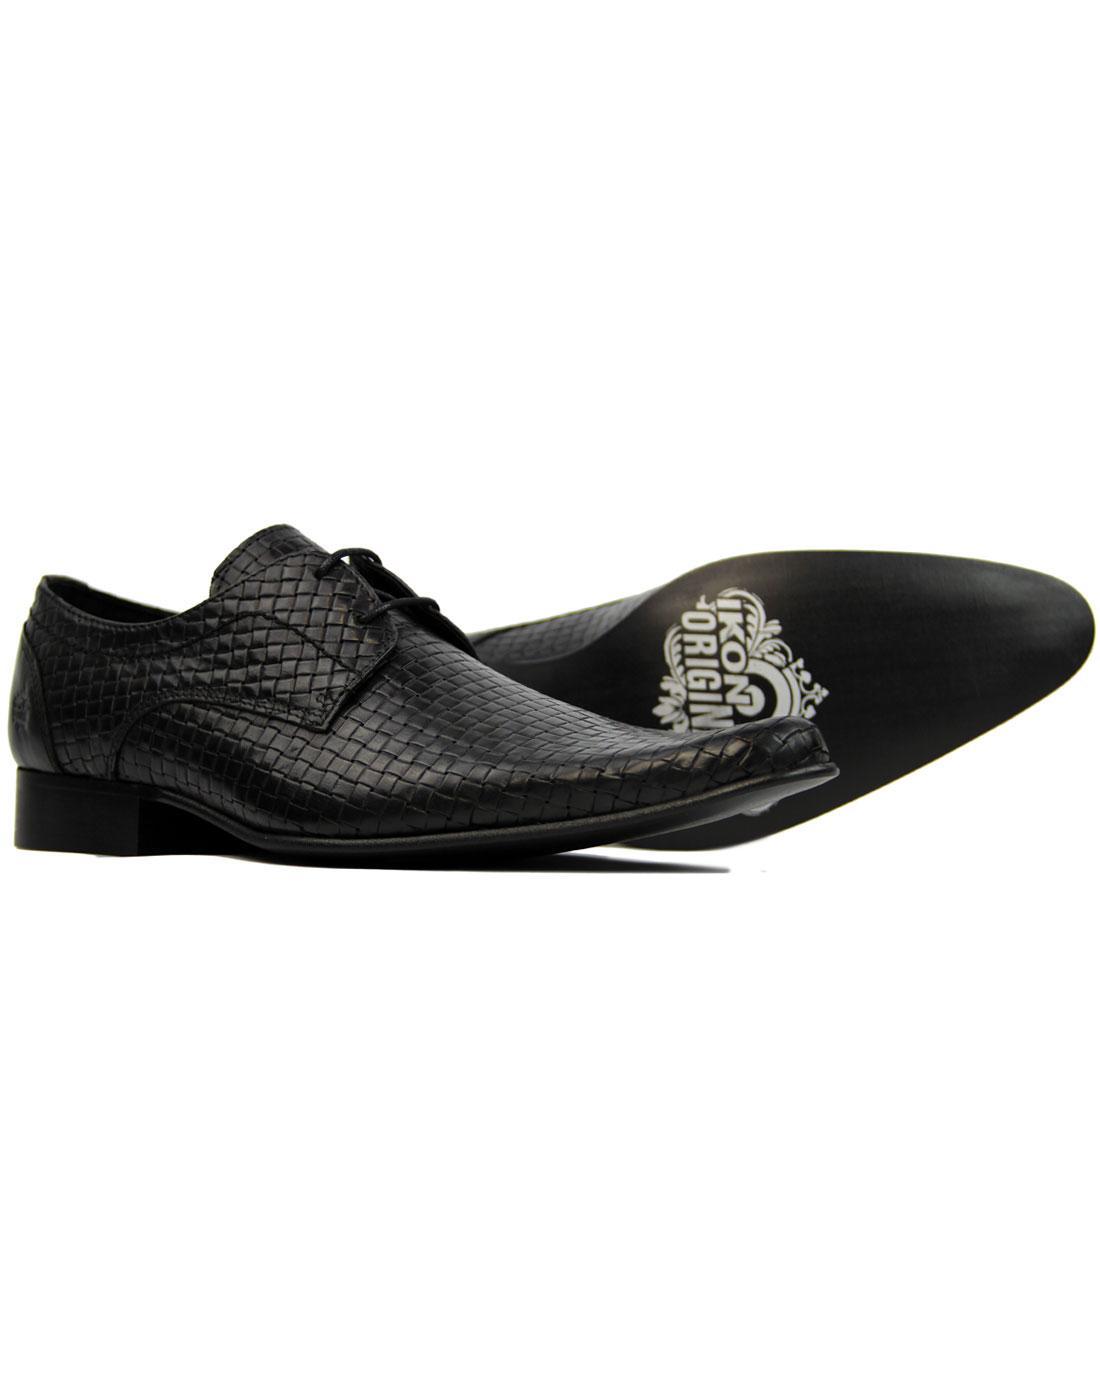 IKON ORIGINAL Buckler Men's Retro Mod Basketweave Shoes in Black